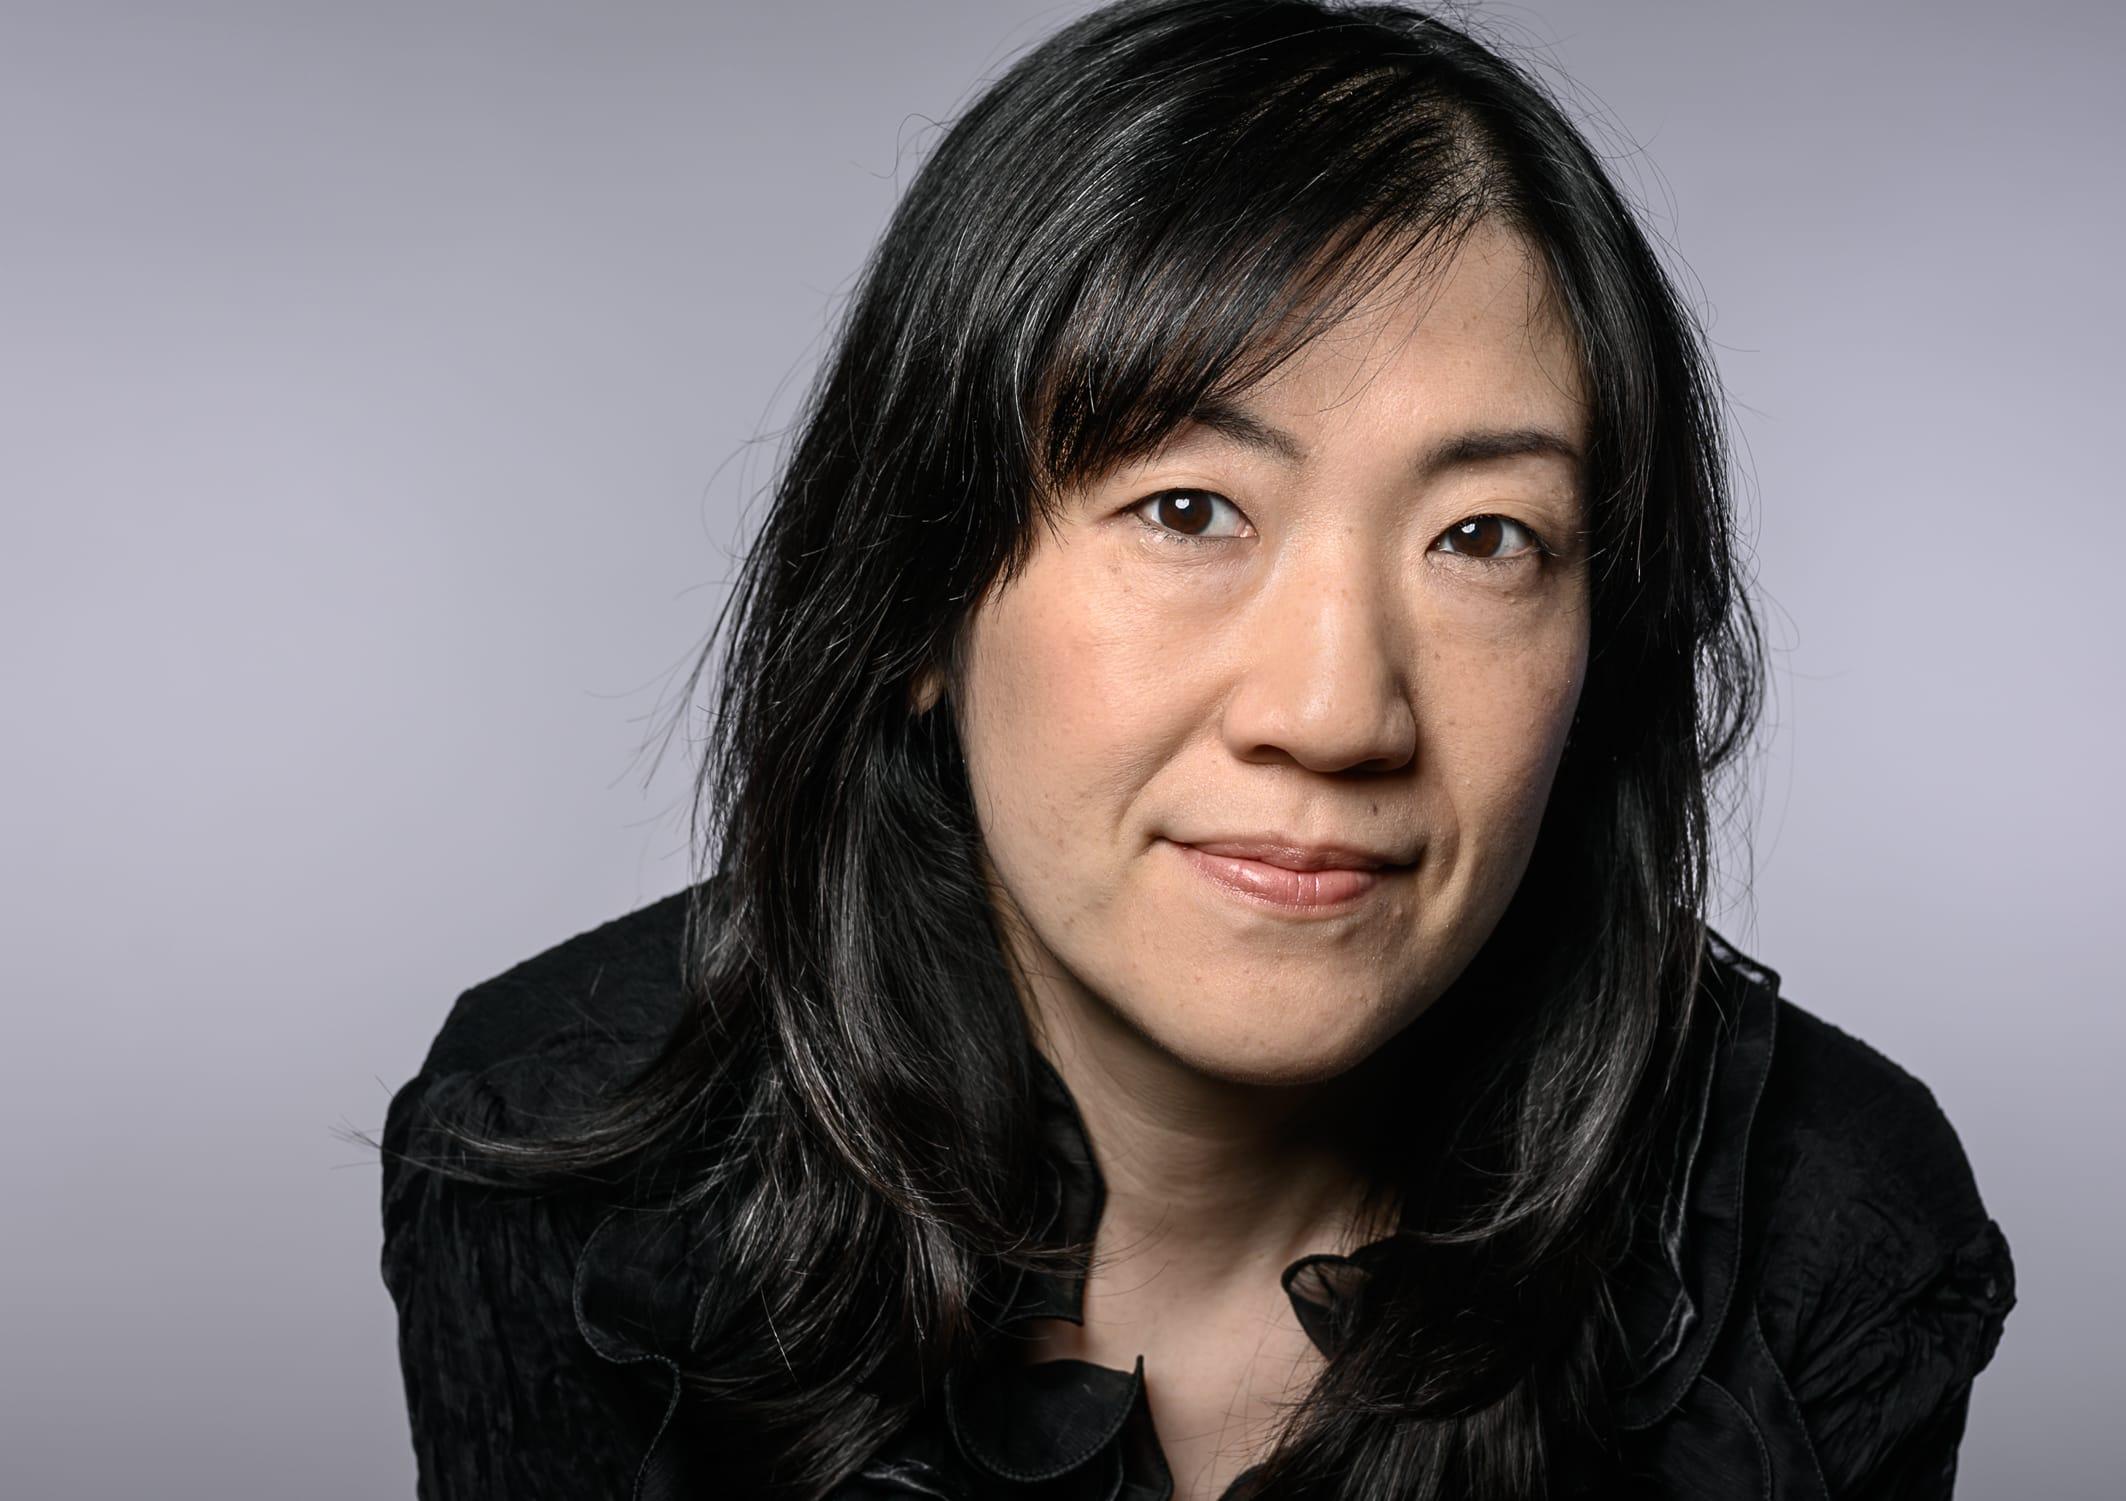 portrait Foto von Kayoko Adler-Tasaki